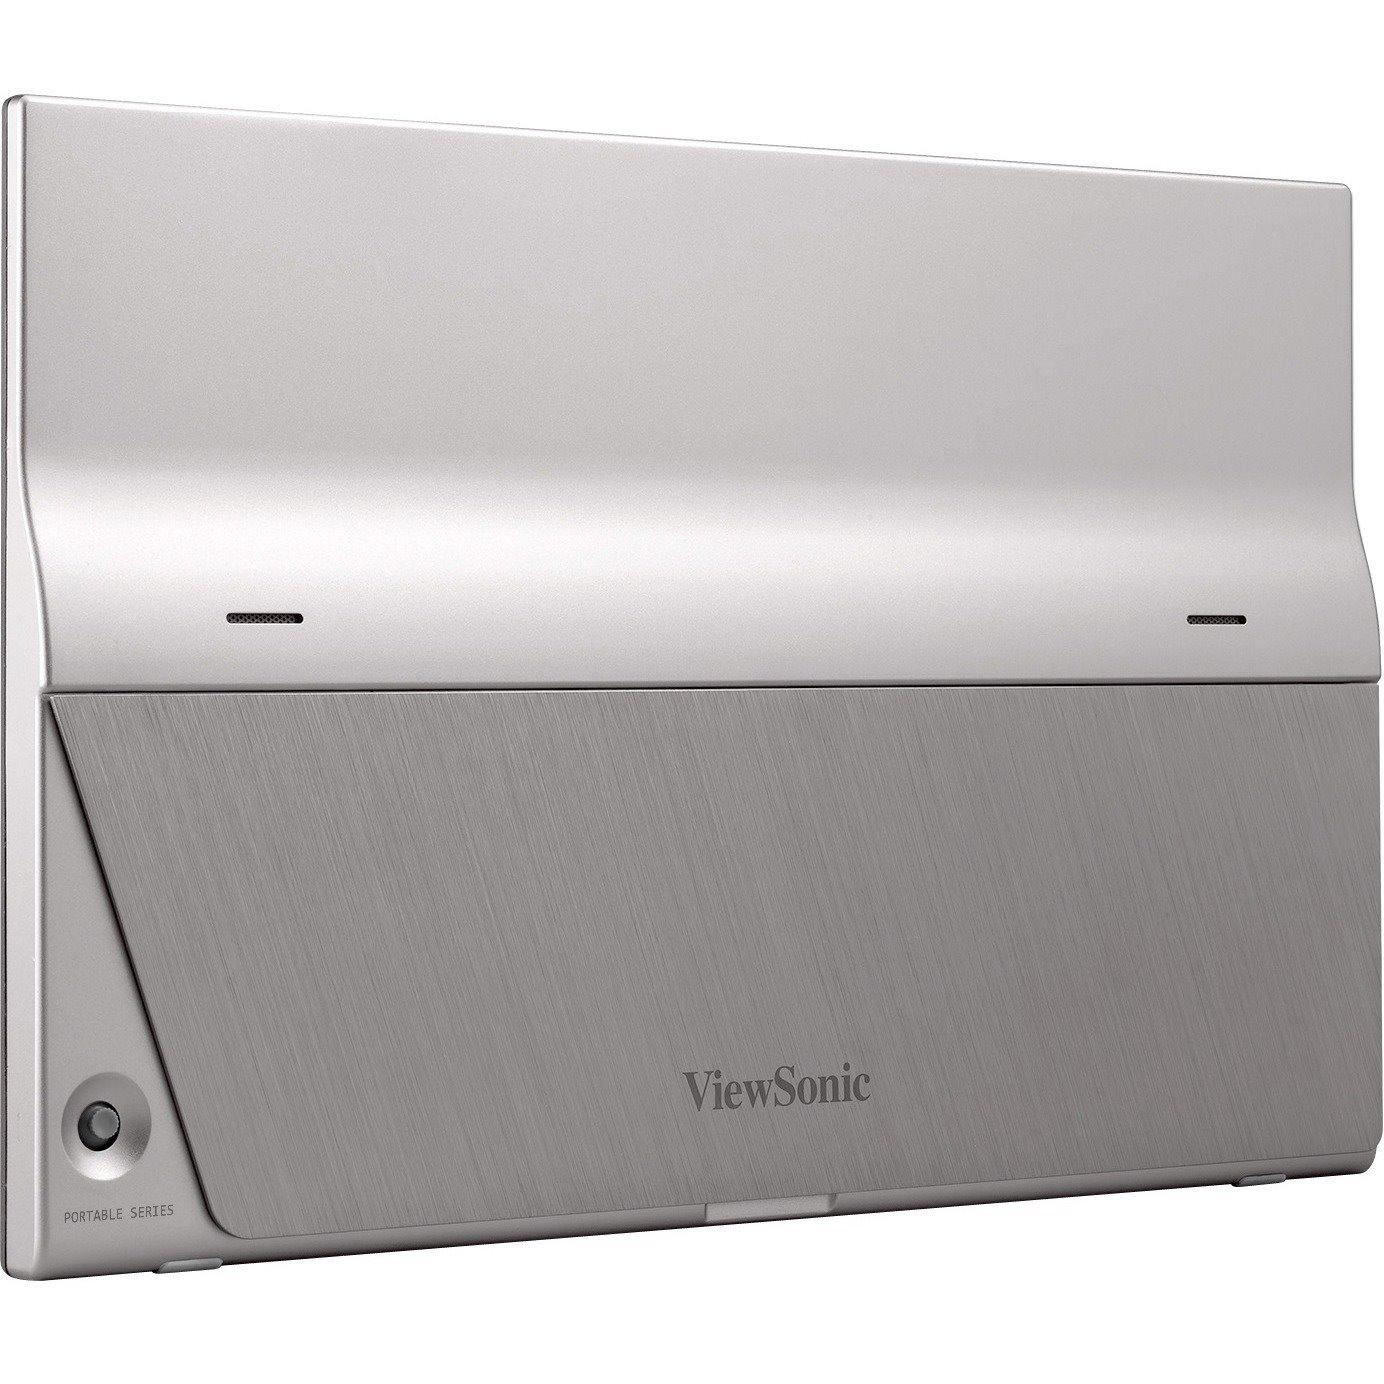 "Viewsonic VG1655 39.6 cm (15.6"") Full HD LED LCD Monitor - 16:9 - Silver"